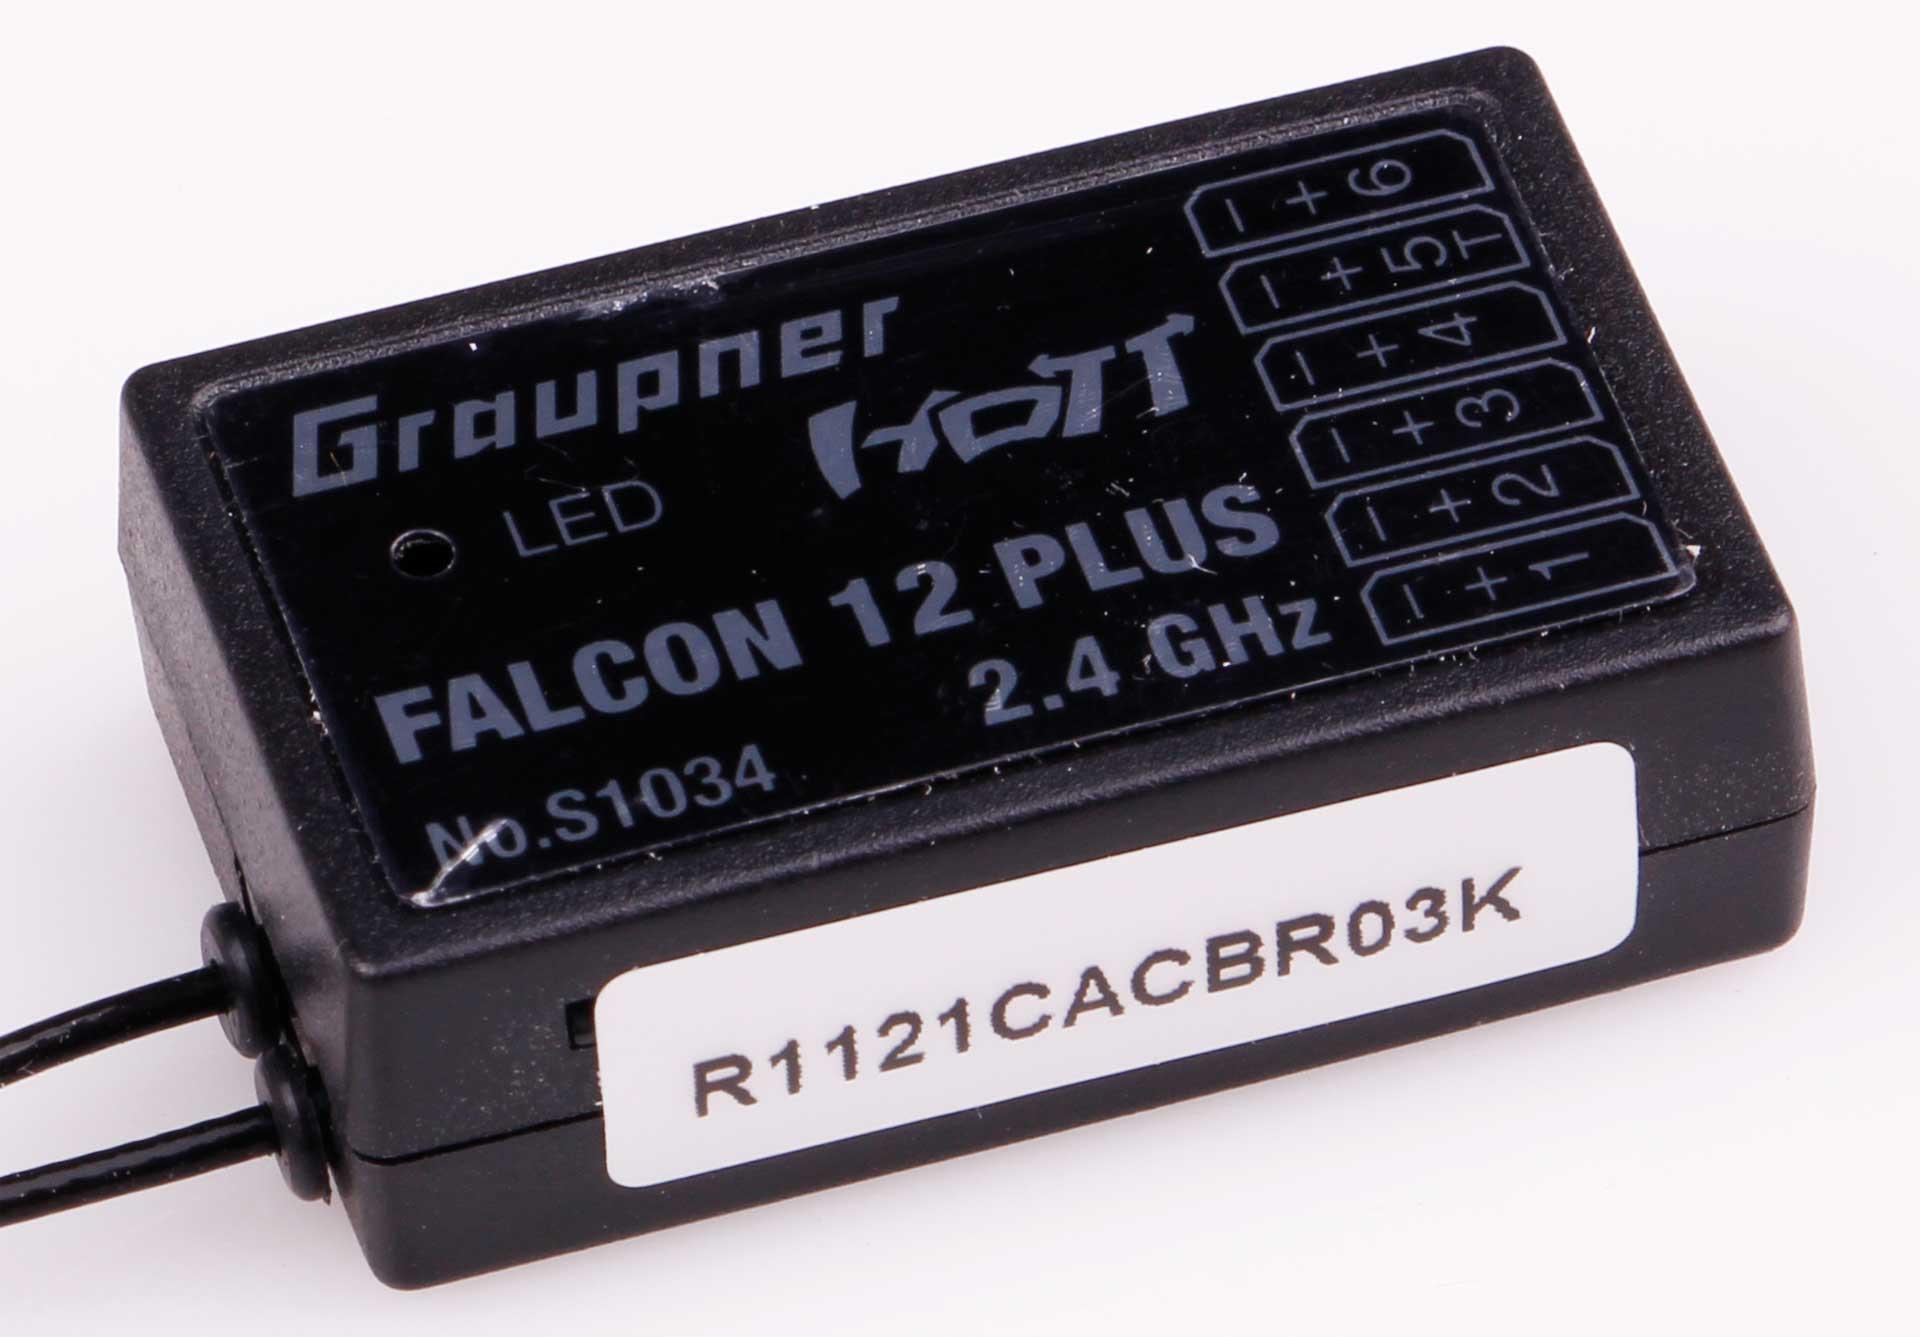 GRAUPNER FALCON 12 PLUS HOTT 3-Achs-Gyro + Vario + Antennendiversity